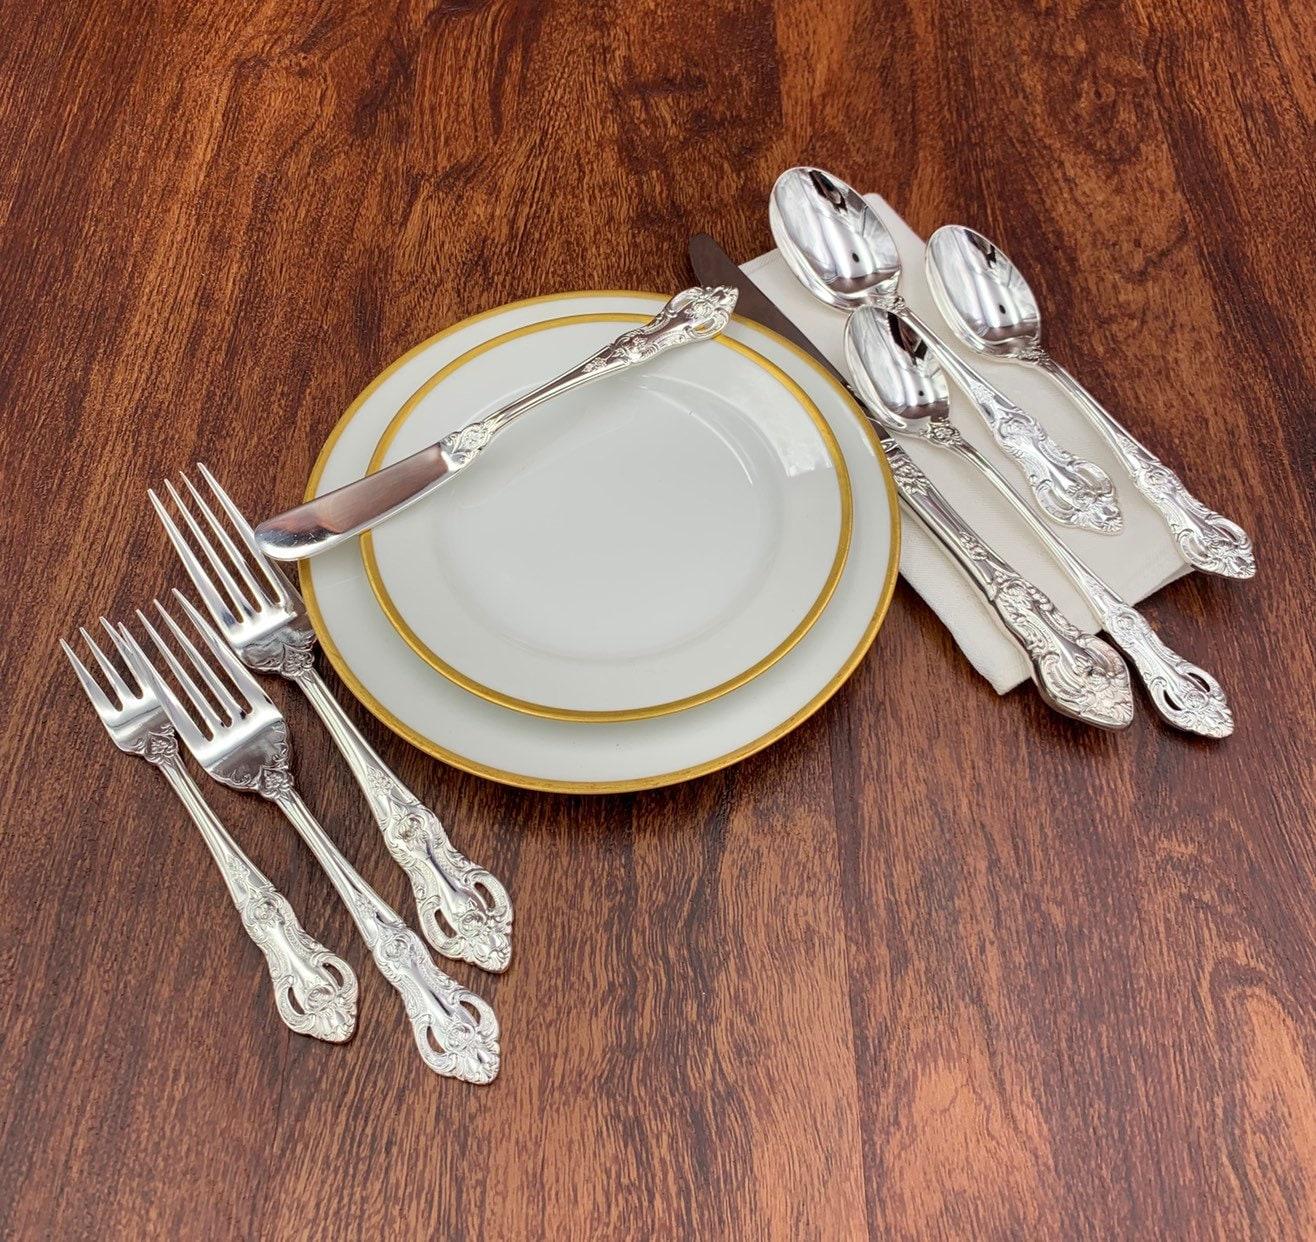 Silverware Wedding Gifts: Vintage Silverware Set In Bakelite Silverware Chest